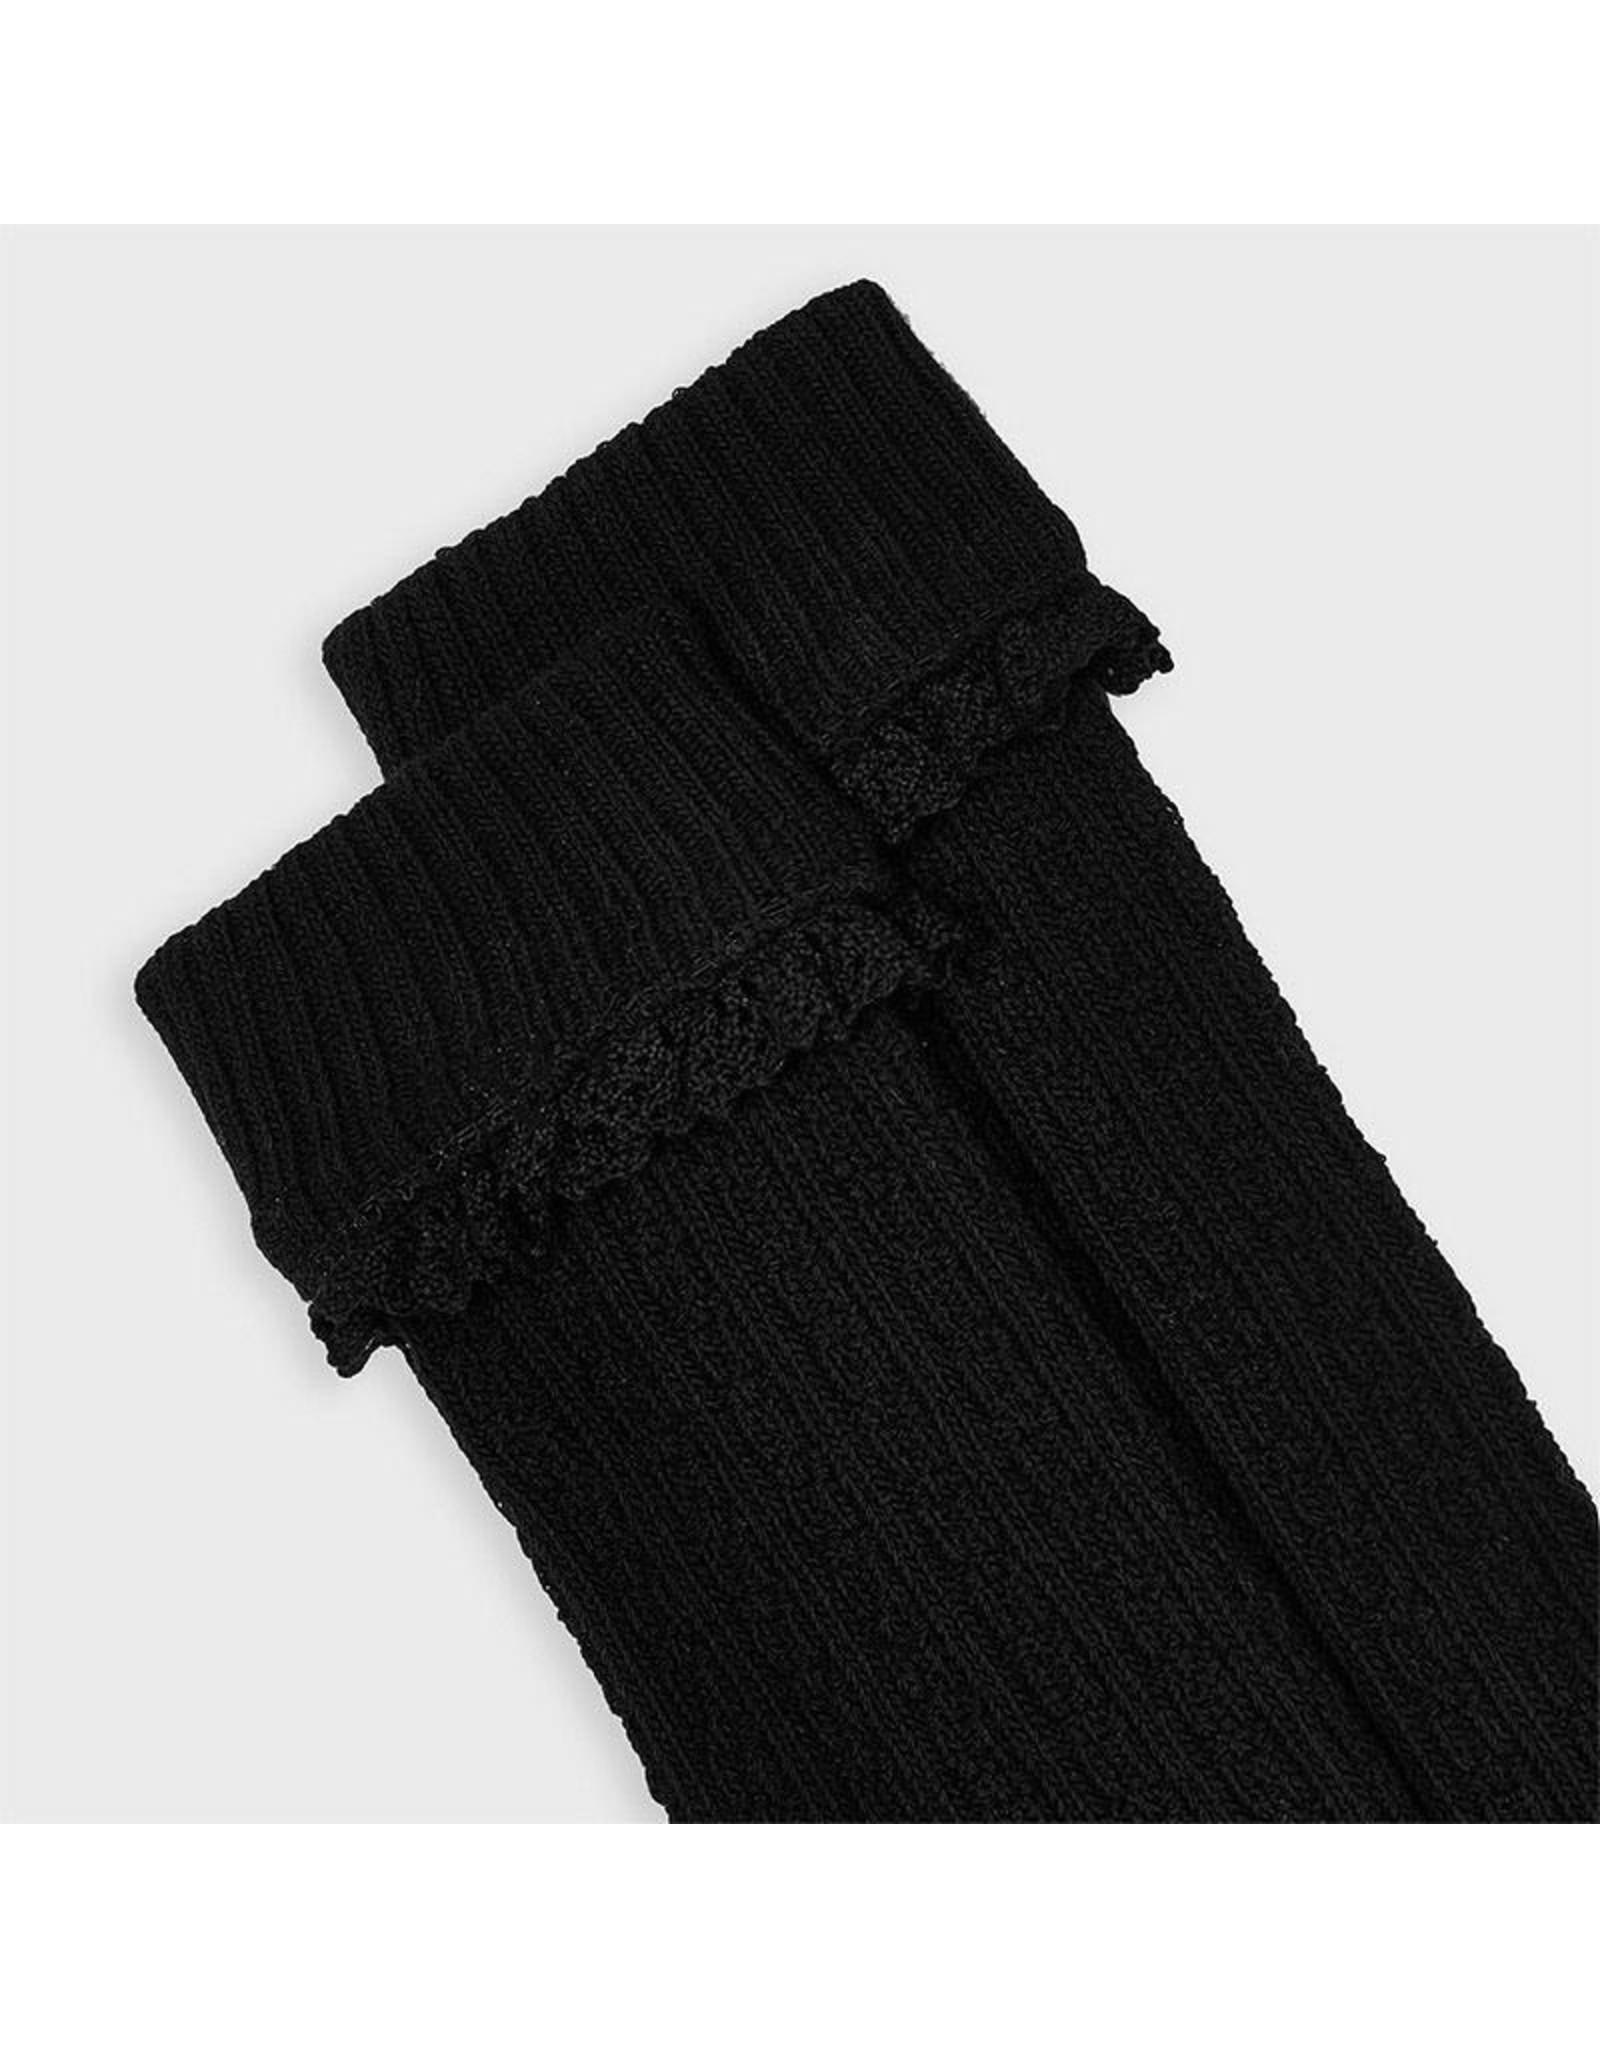 Mayoral Socks Black